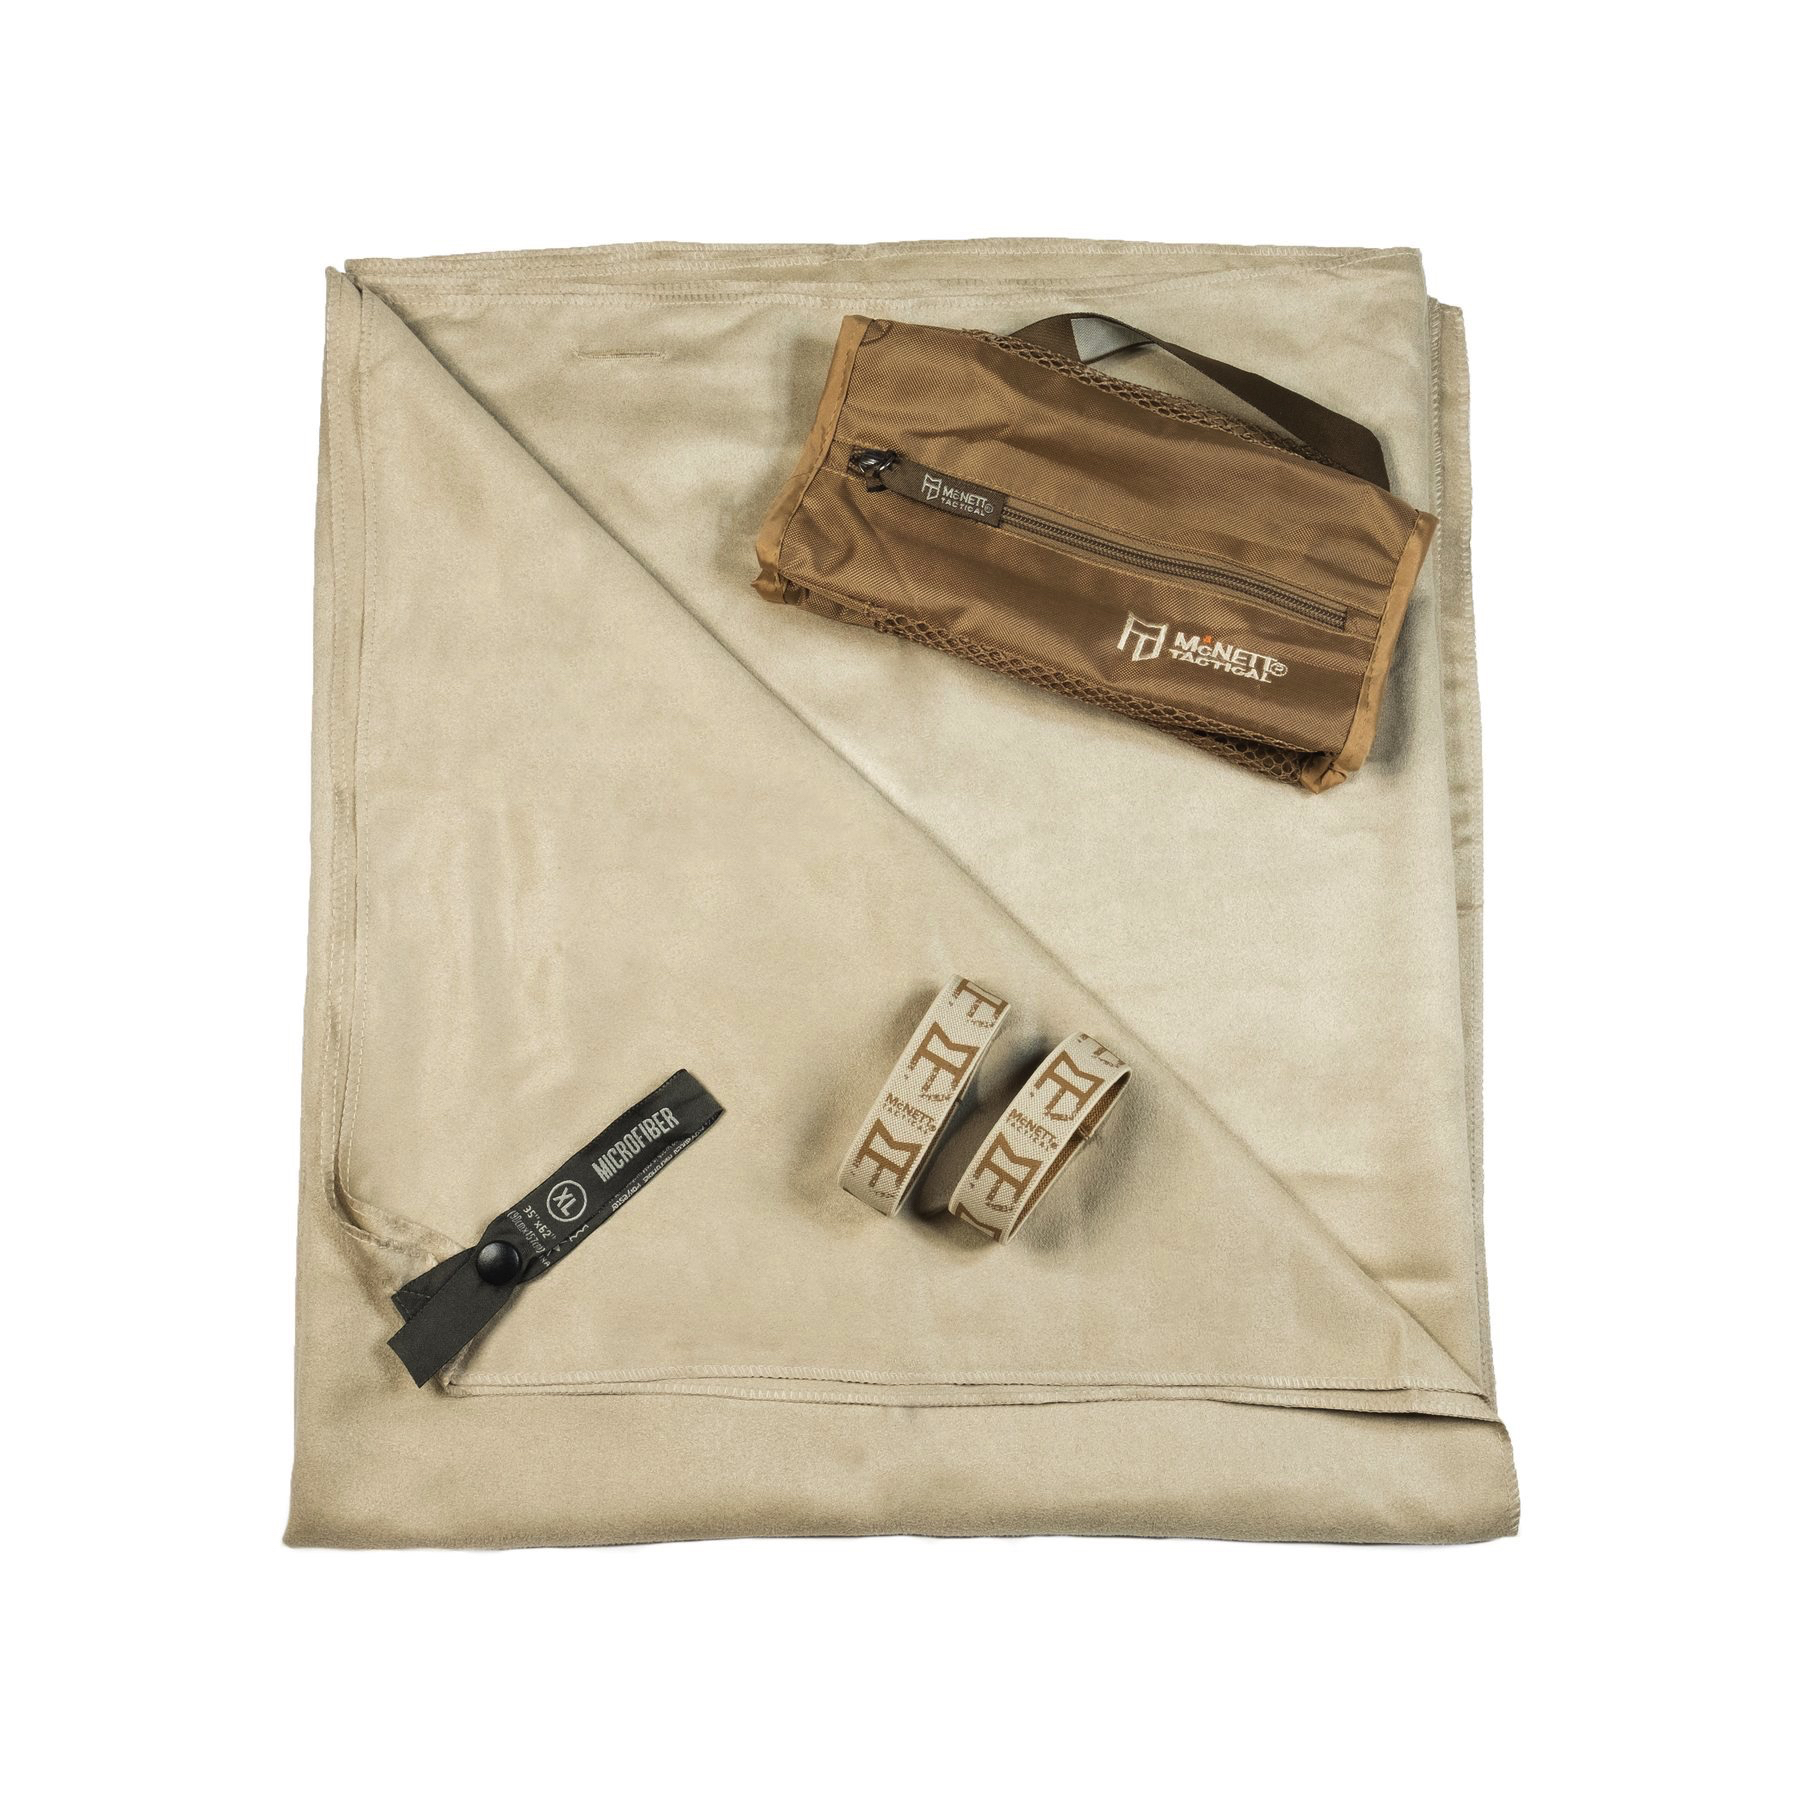 Gear Aid McNett Tactical Ultra Compact Microfiber Towel /& Bag Navy Blue X-Large